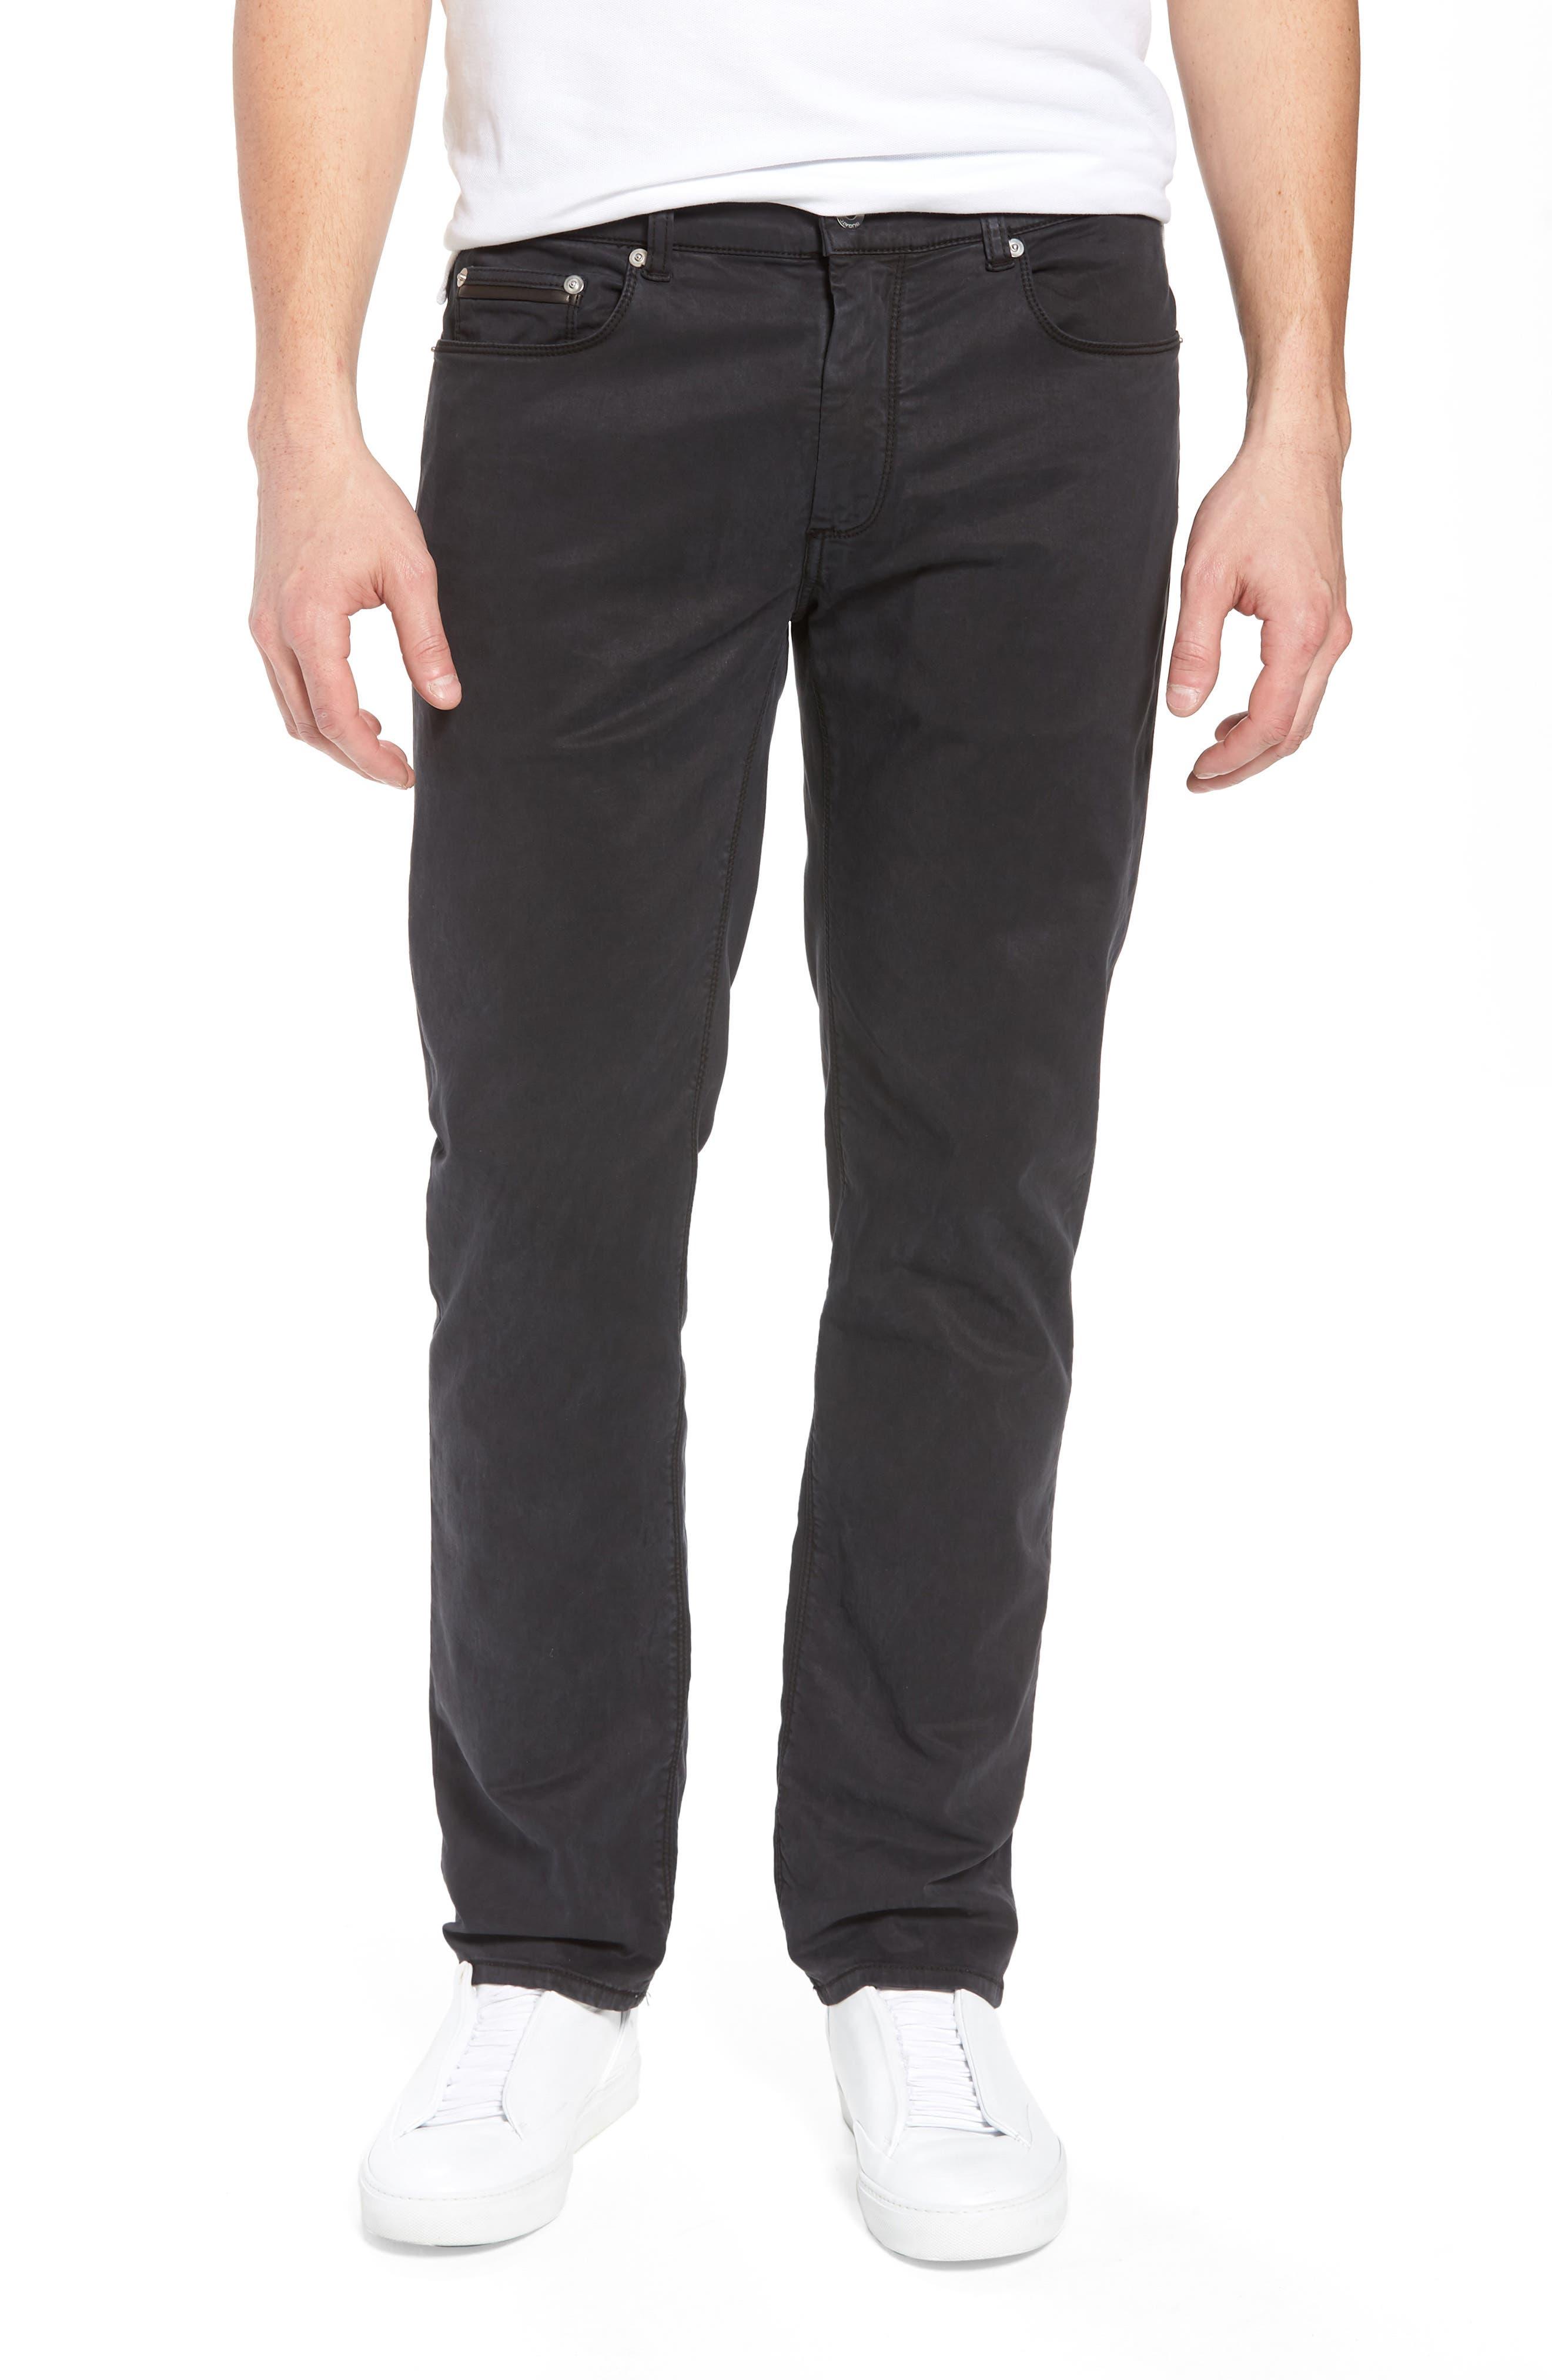 Alternate Image 1 Selected - Bugatchi Trim Fit Pants